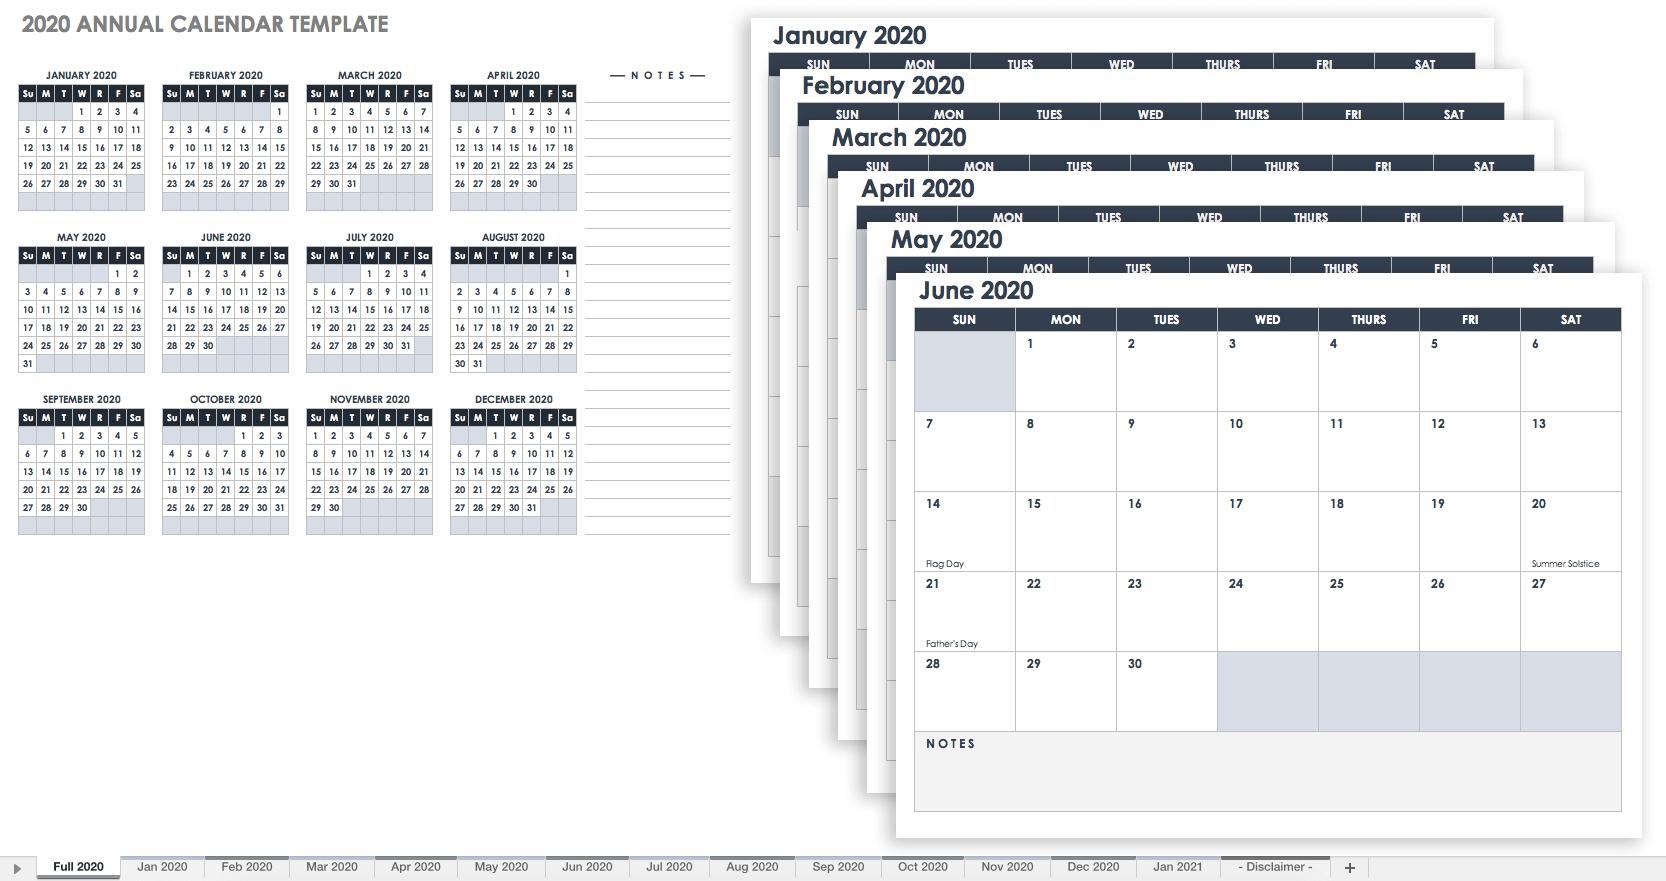 Weekly Calendar 2020 Template Students 7 Days A Week Calendar Template For 7 Days